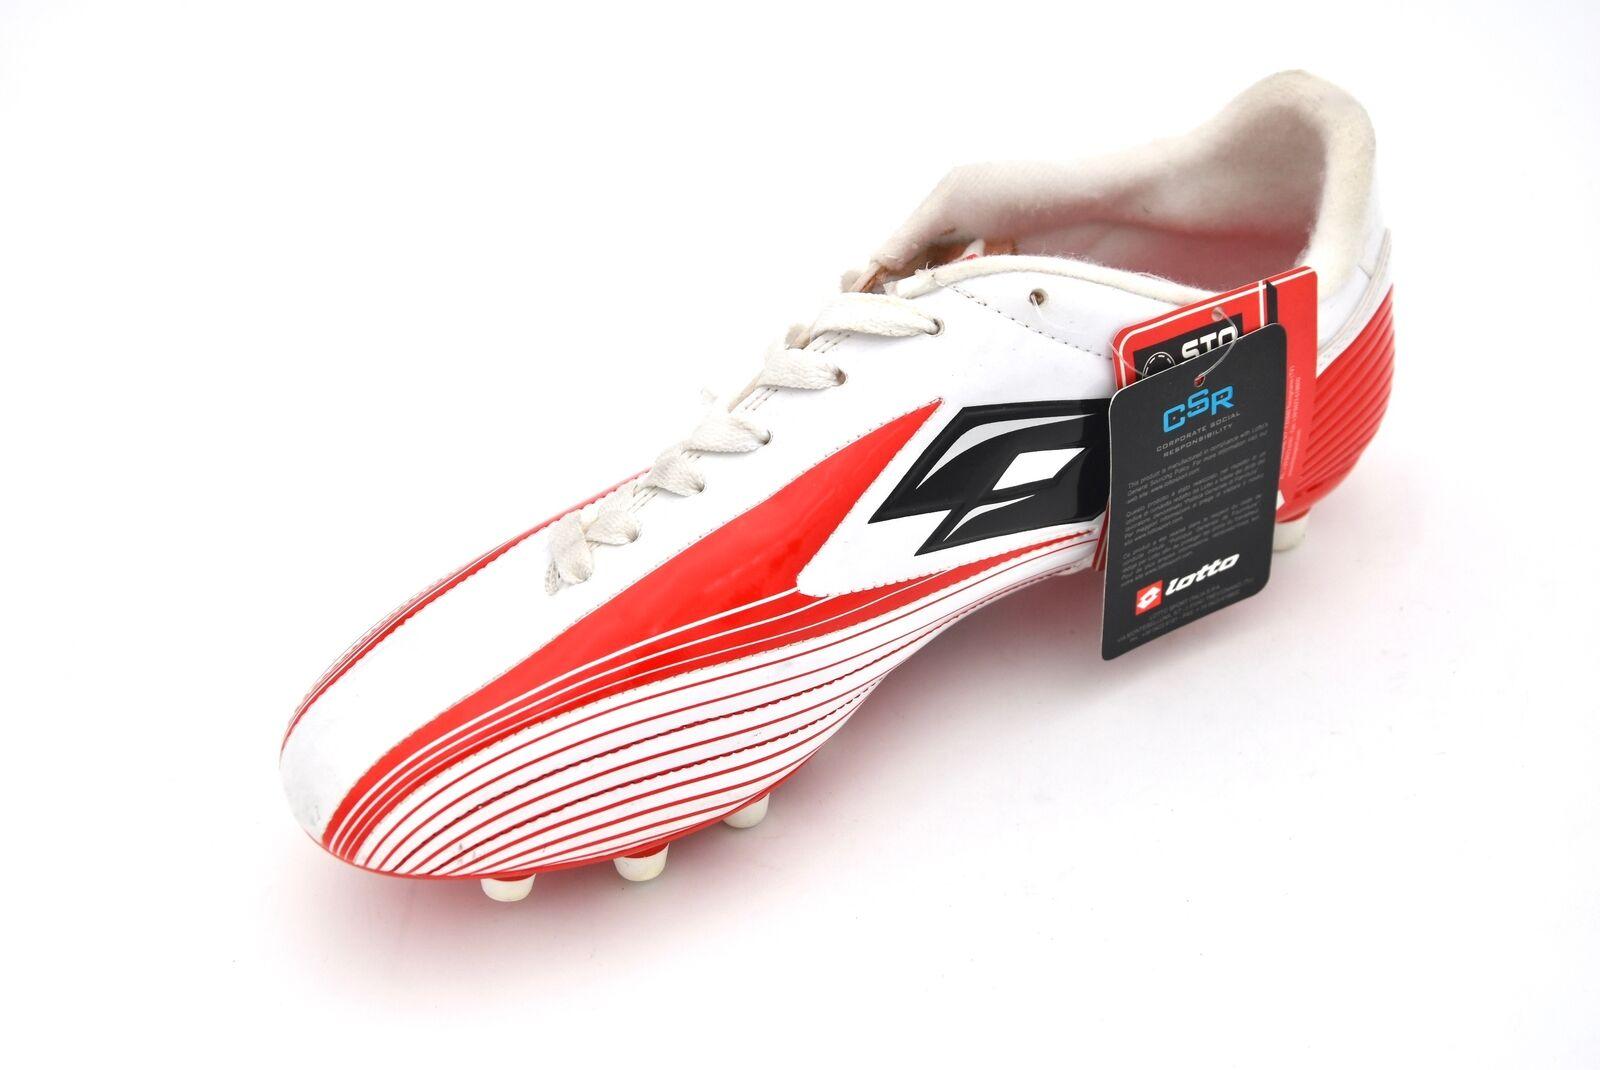 LOTTO MAN SPORTS FOOTBALL SOCCER CLEATS Chaussures CODE K3354 ZHERO FLASH TRE FG.